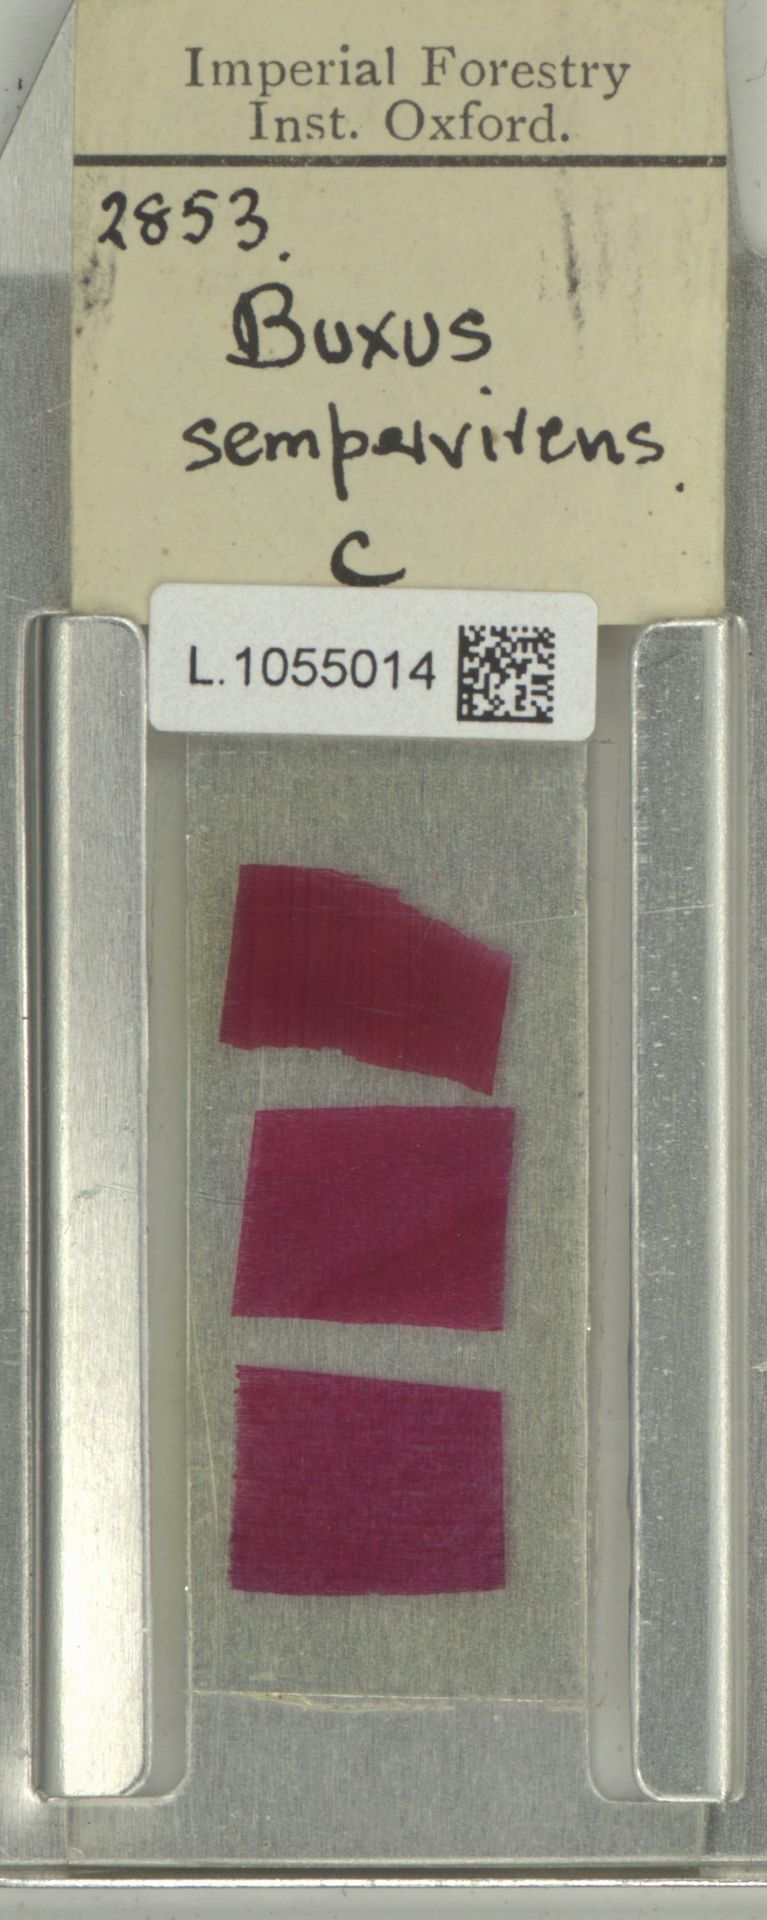 L.1055014 | Buxus sempervirens L.